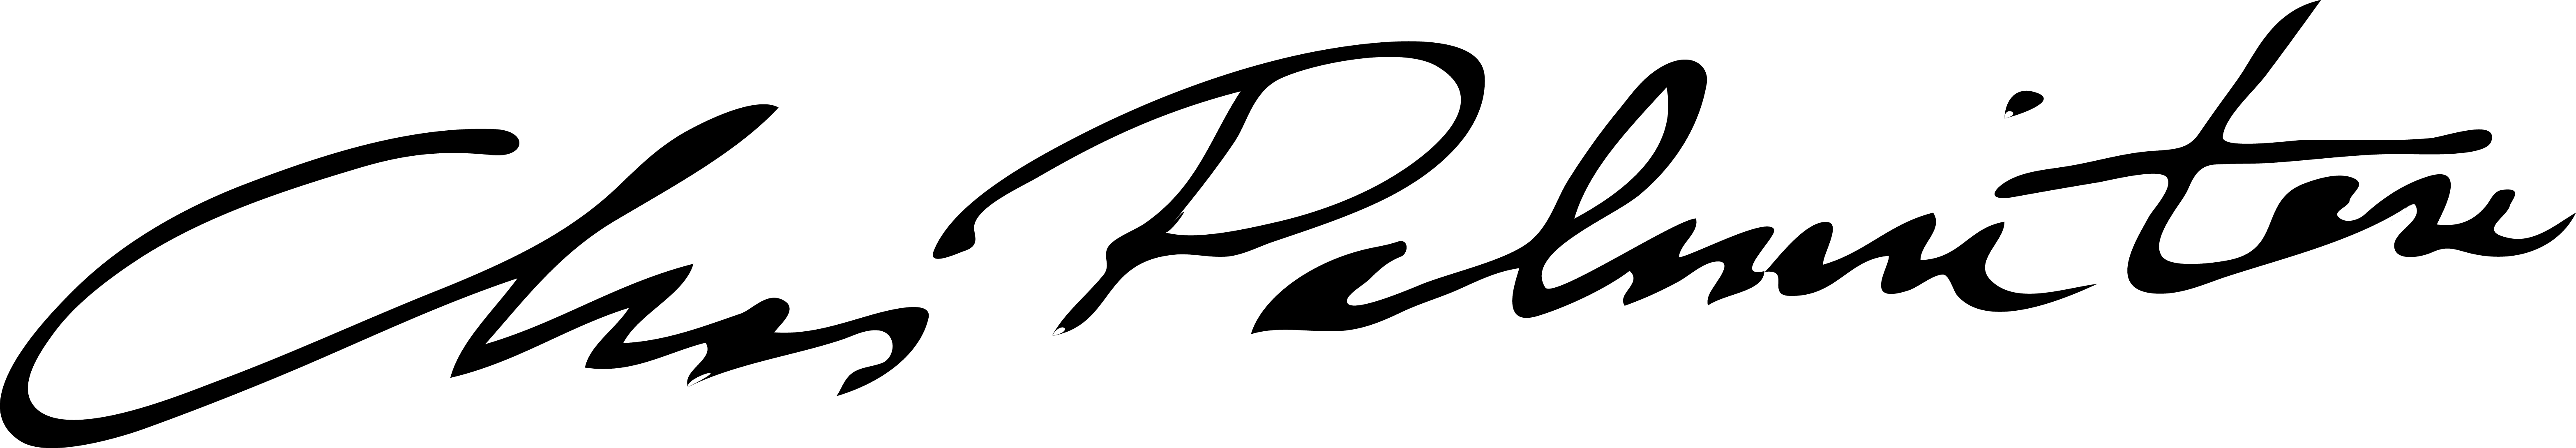 Chas Palminteri's Signature